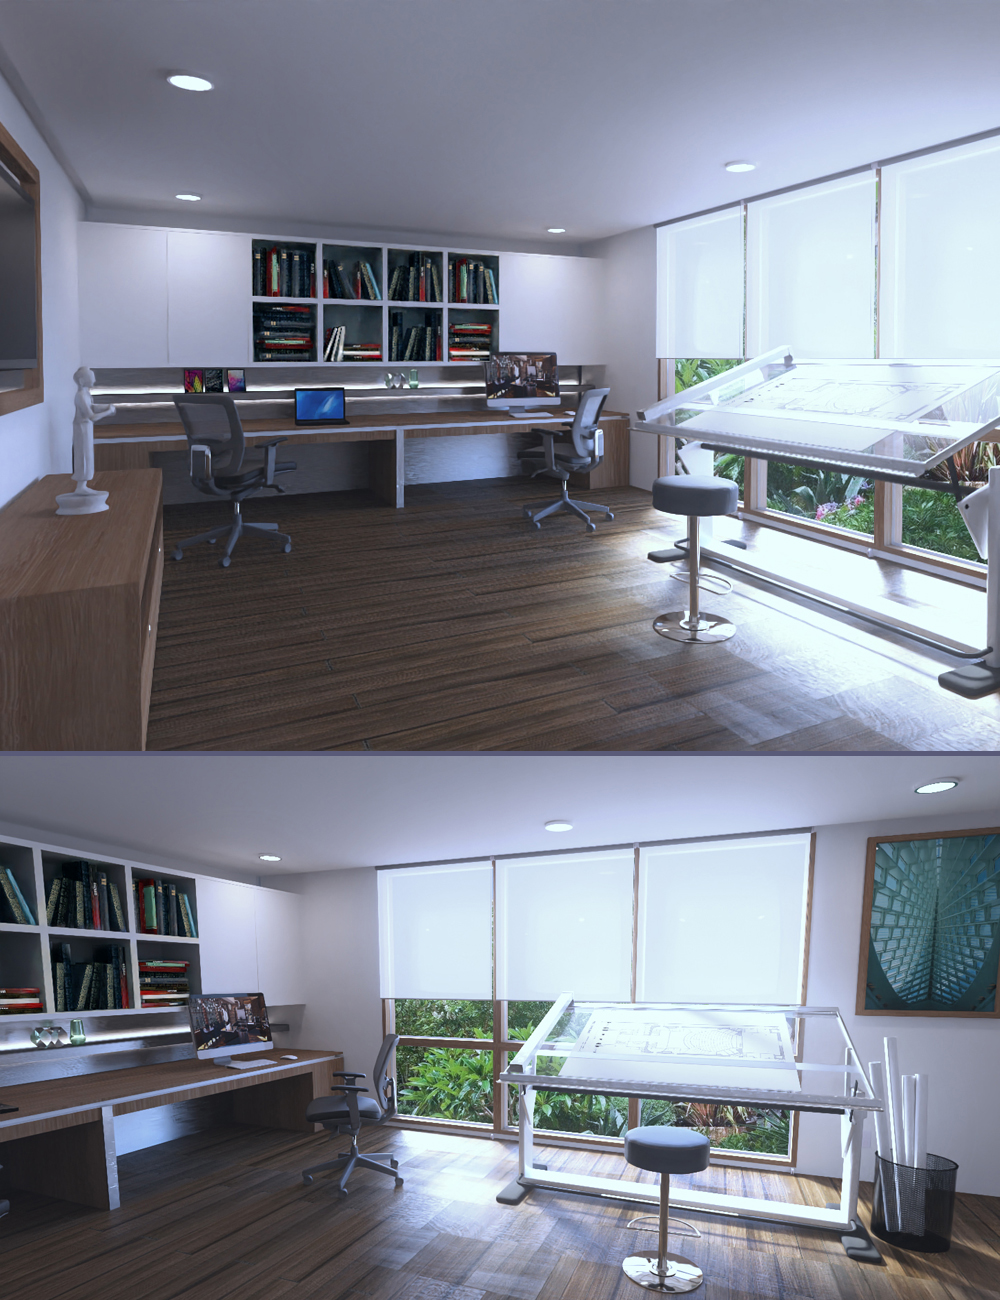 Architect Office by: Digitallab3D, 3D Models by Daz 3D